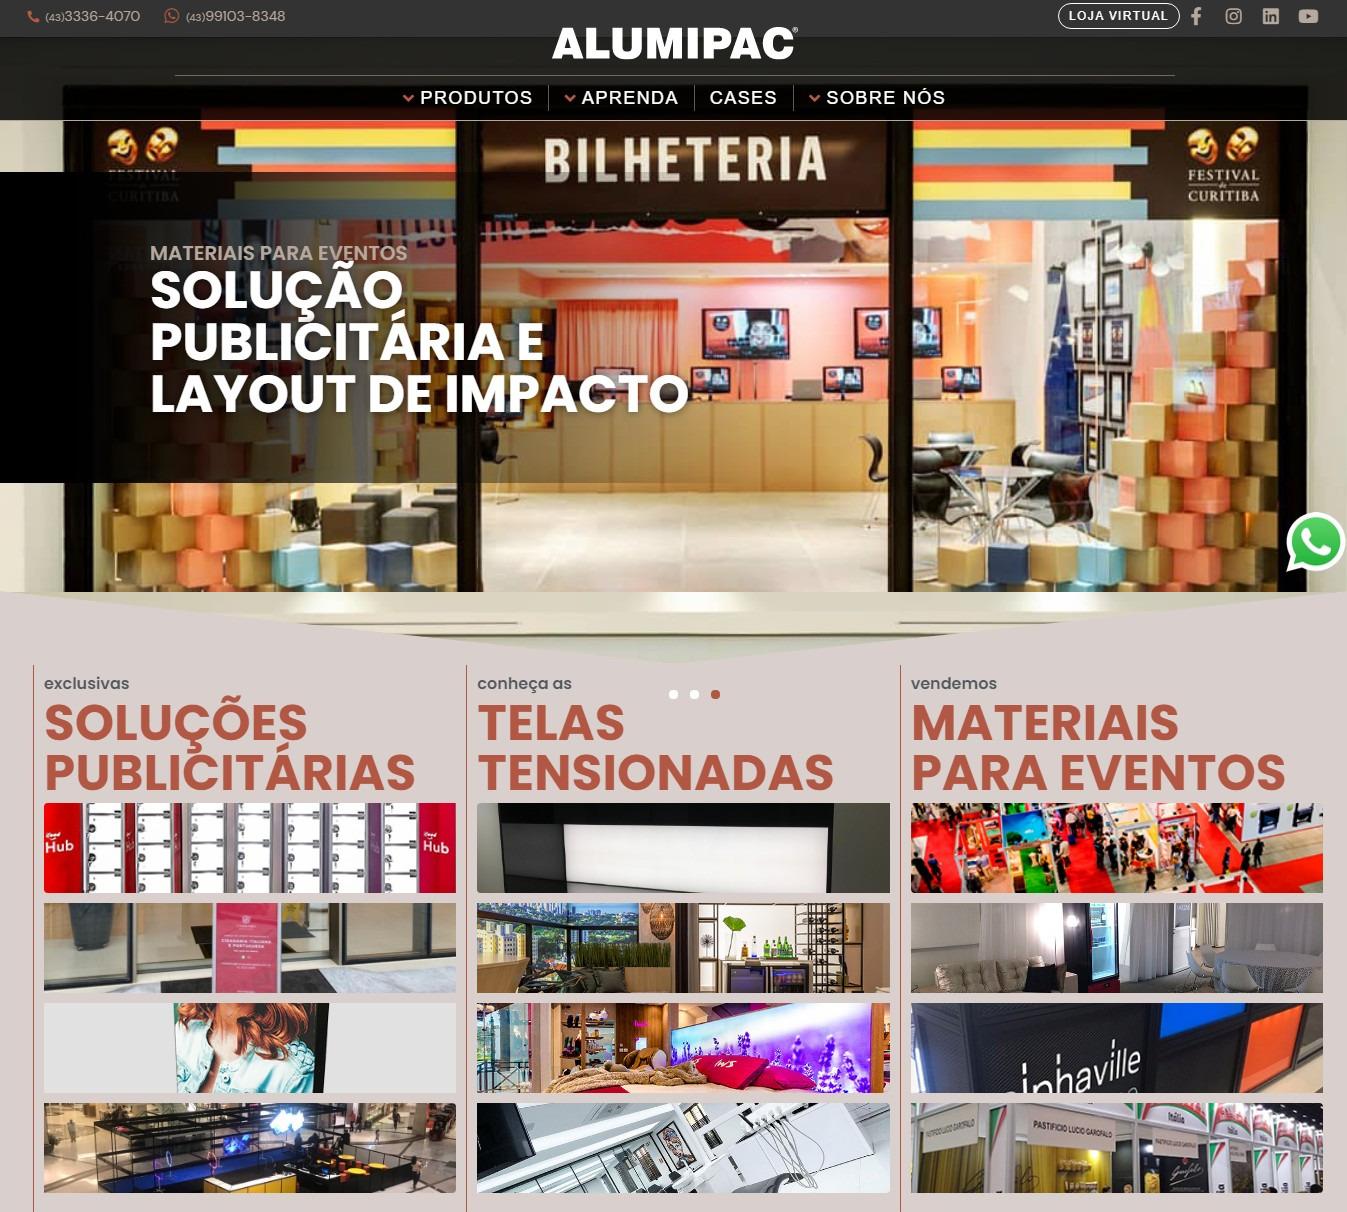 Alumipac